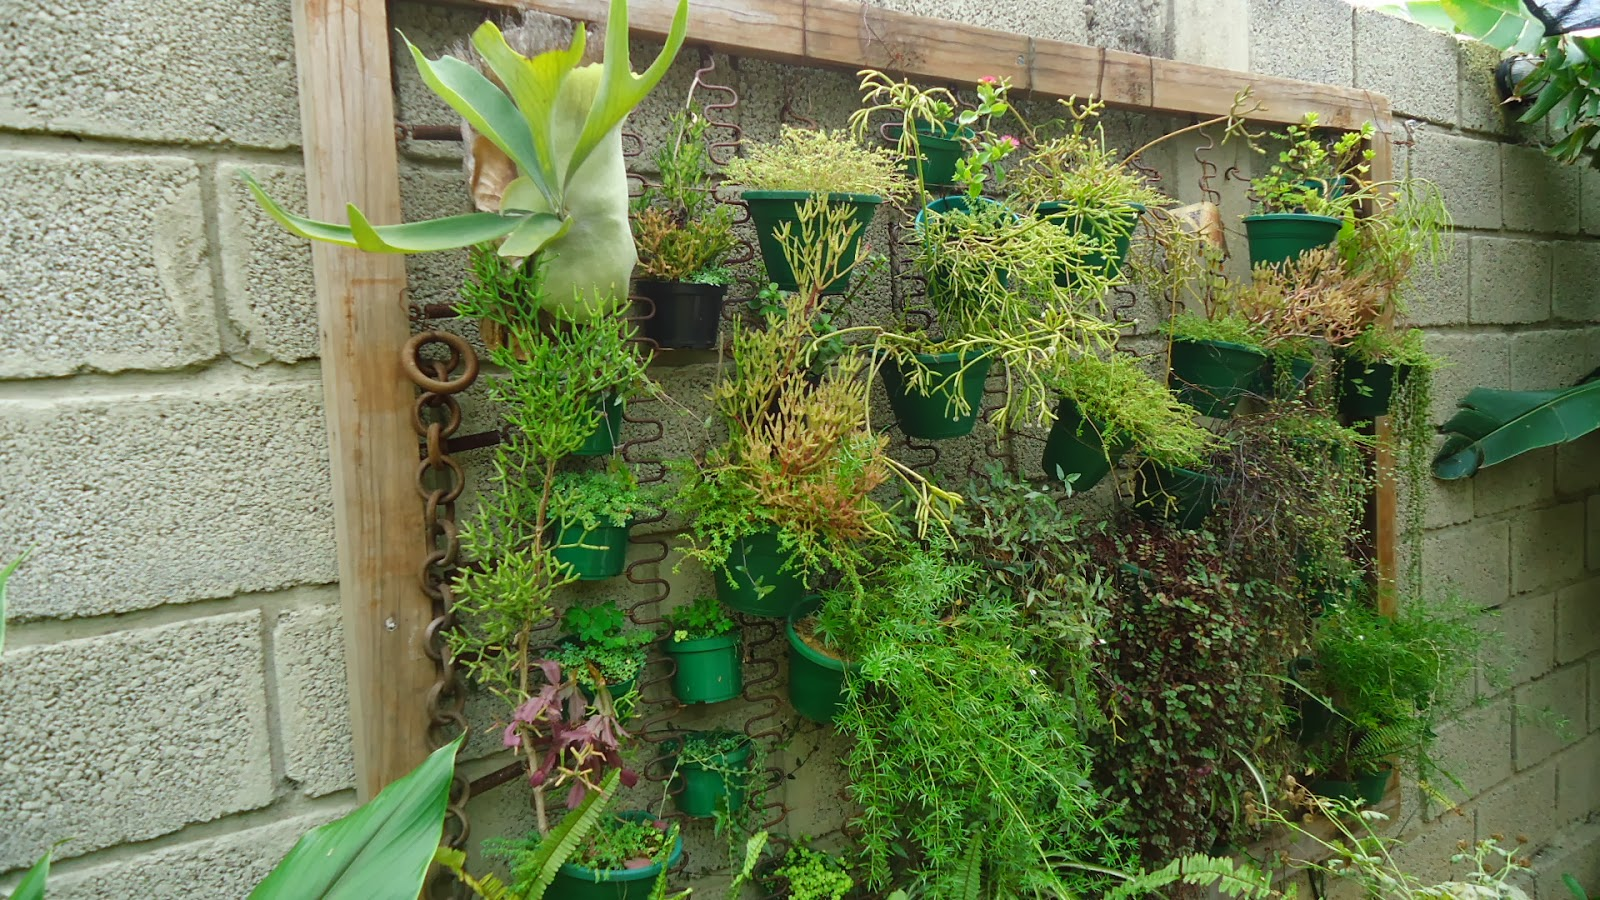 quintal jardim vertical:Cheiro de Quintal: JARDIM VERTICAL